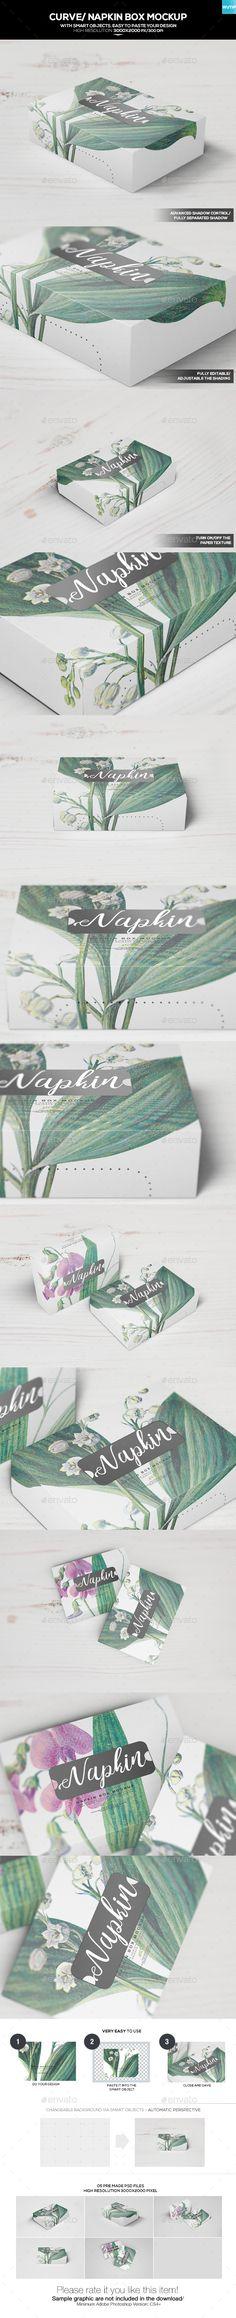 Curve/ Napkin Box Mockup